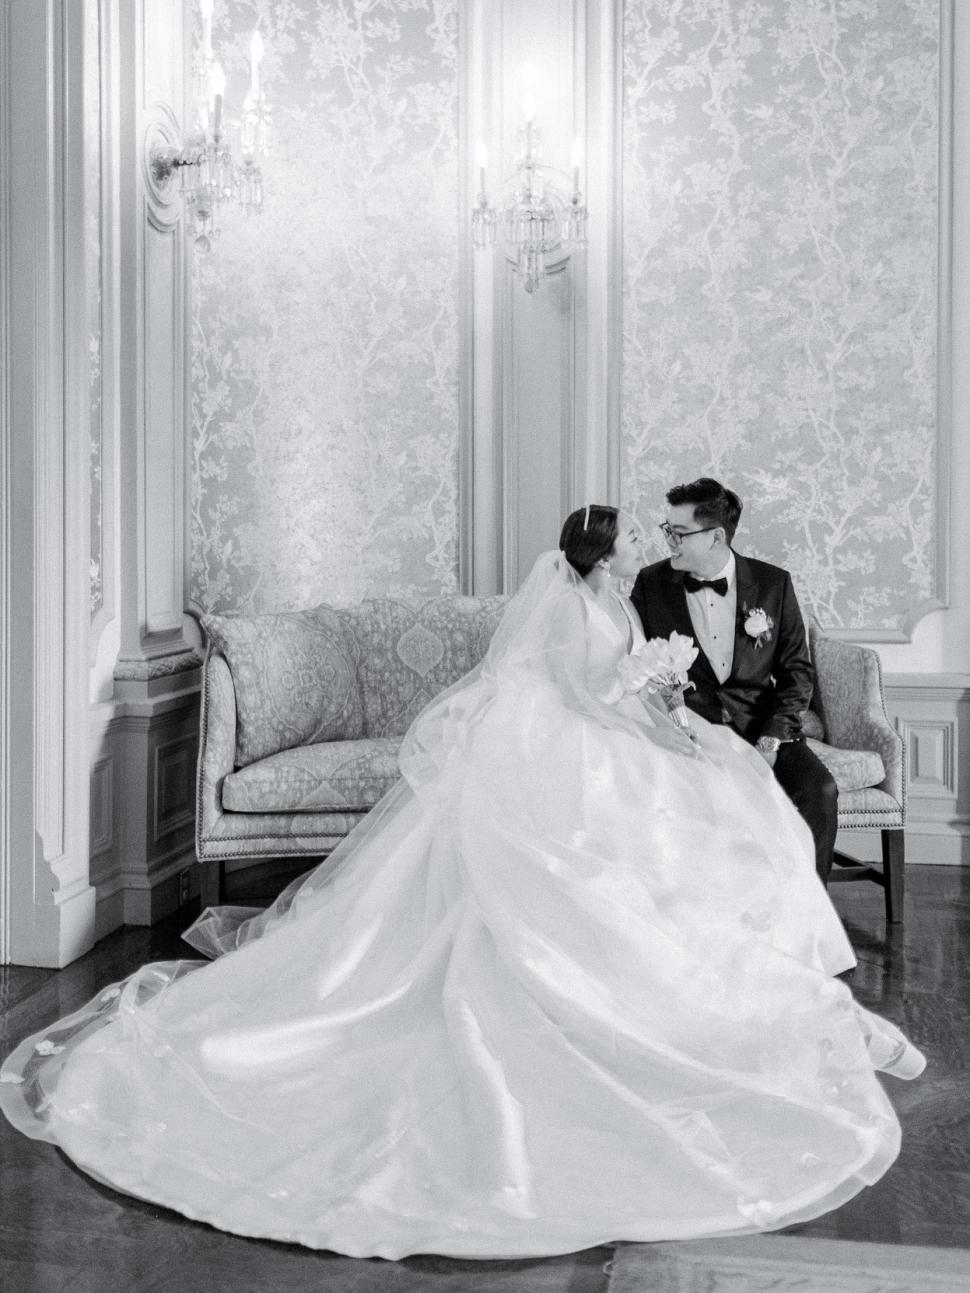 Bourne-Mansion-Wedding-Photos-Cassi-Claire-Long-Island-Wedding-Photographer_36.jpg